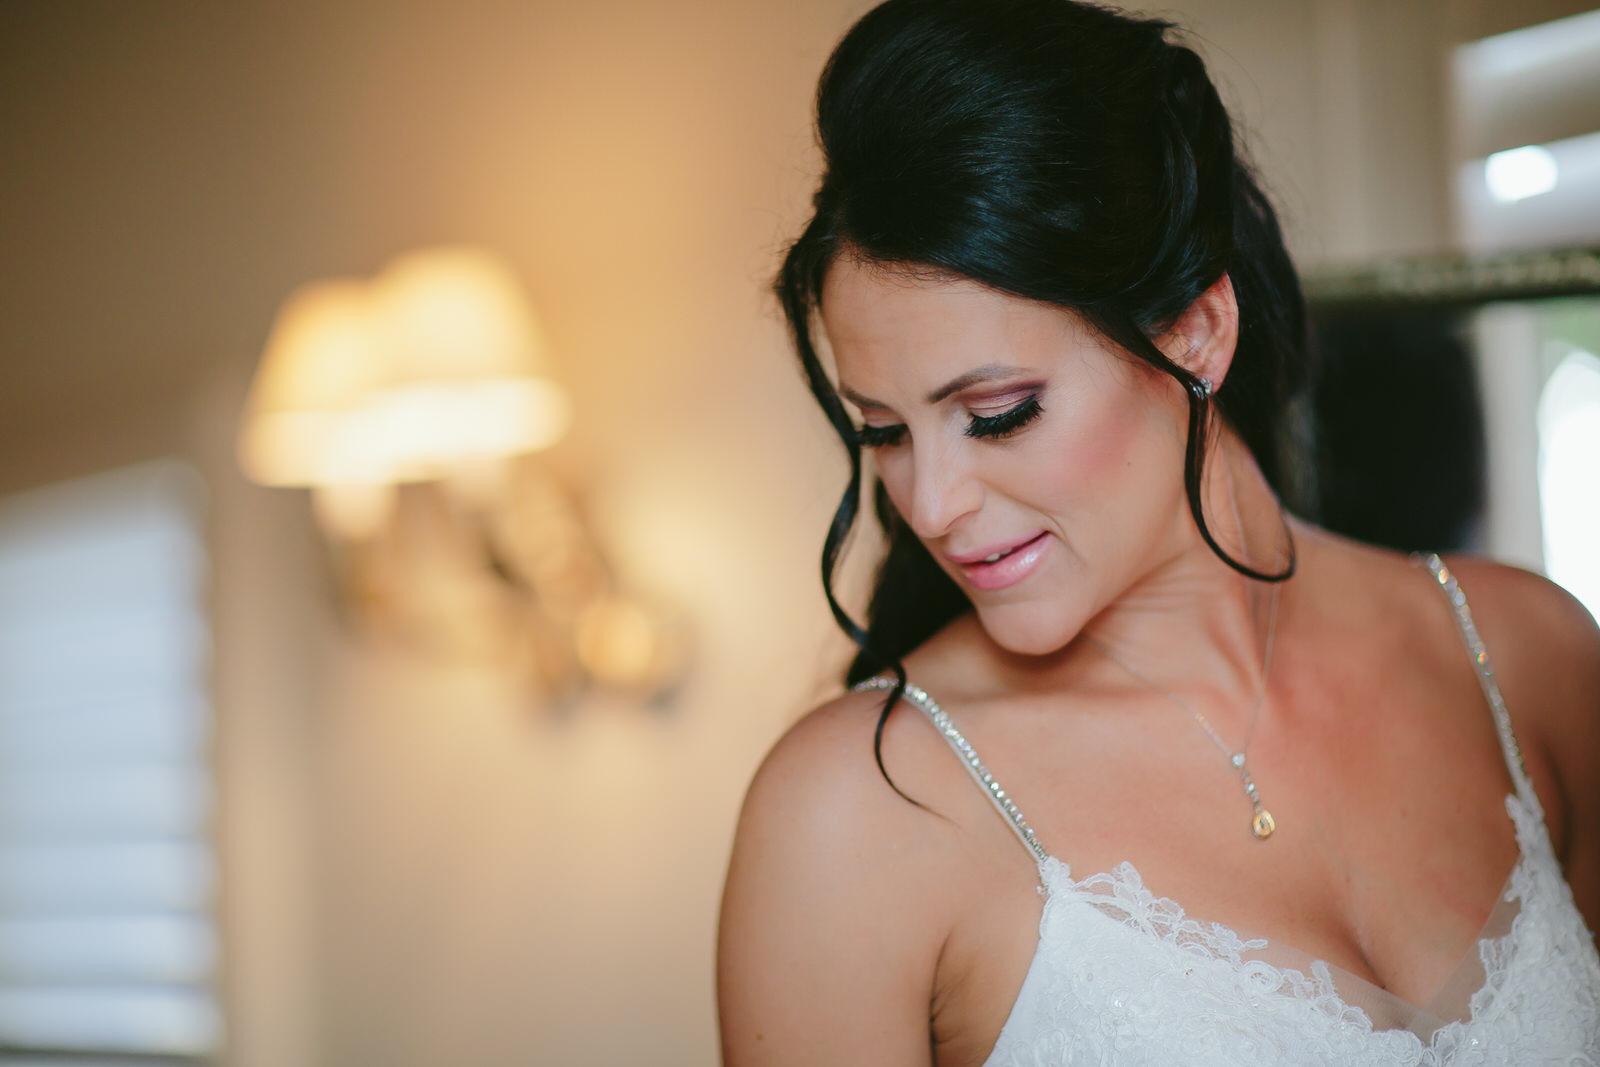 stephanie_lynn_wedding_photography_tiny_house_photo_best_destination_wedding_photographer_lgbtq.jpg